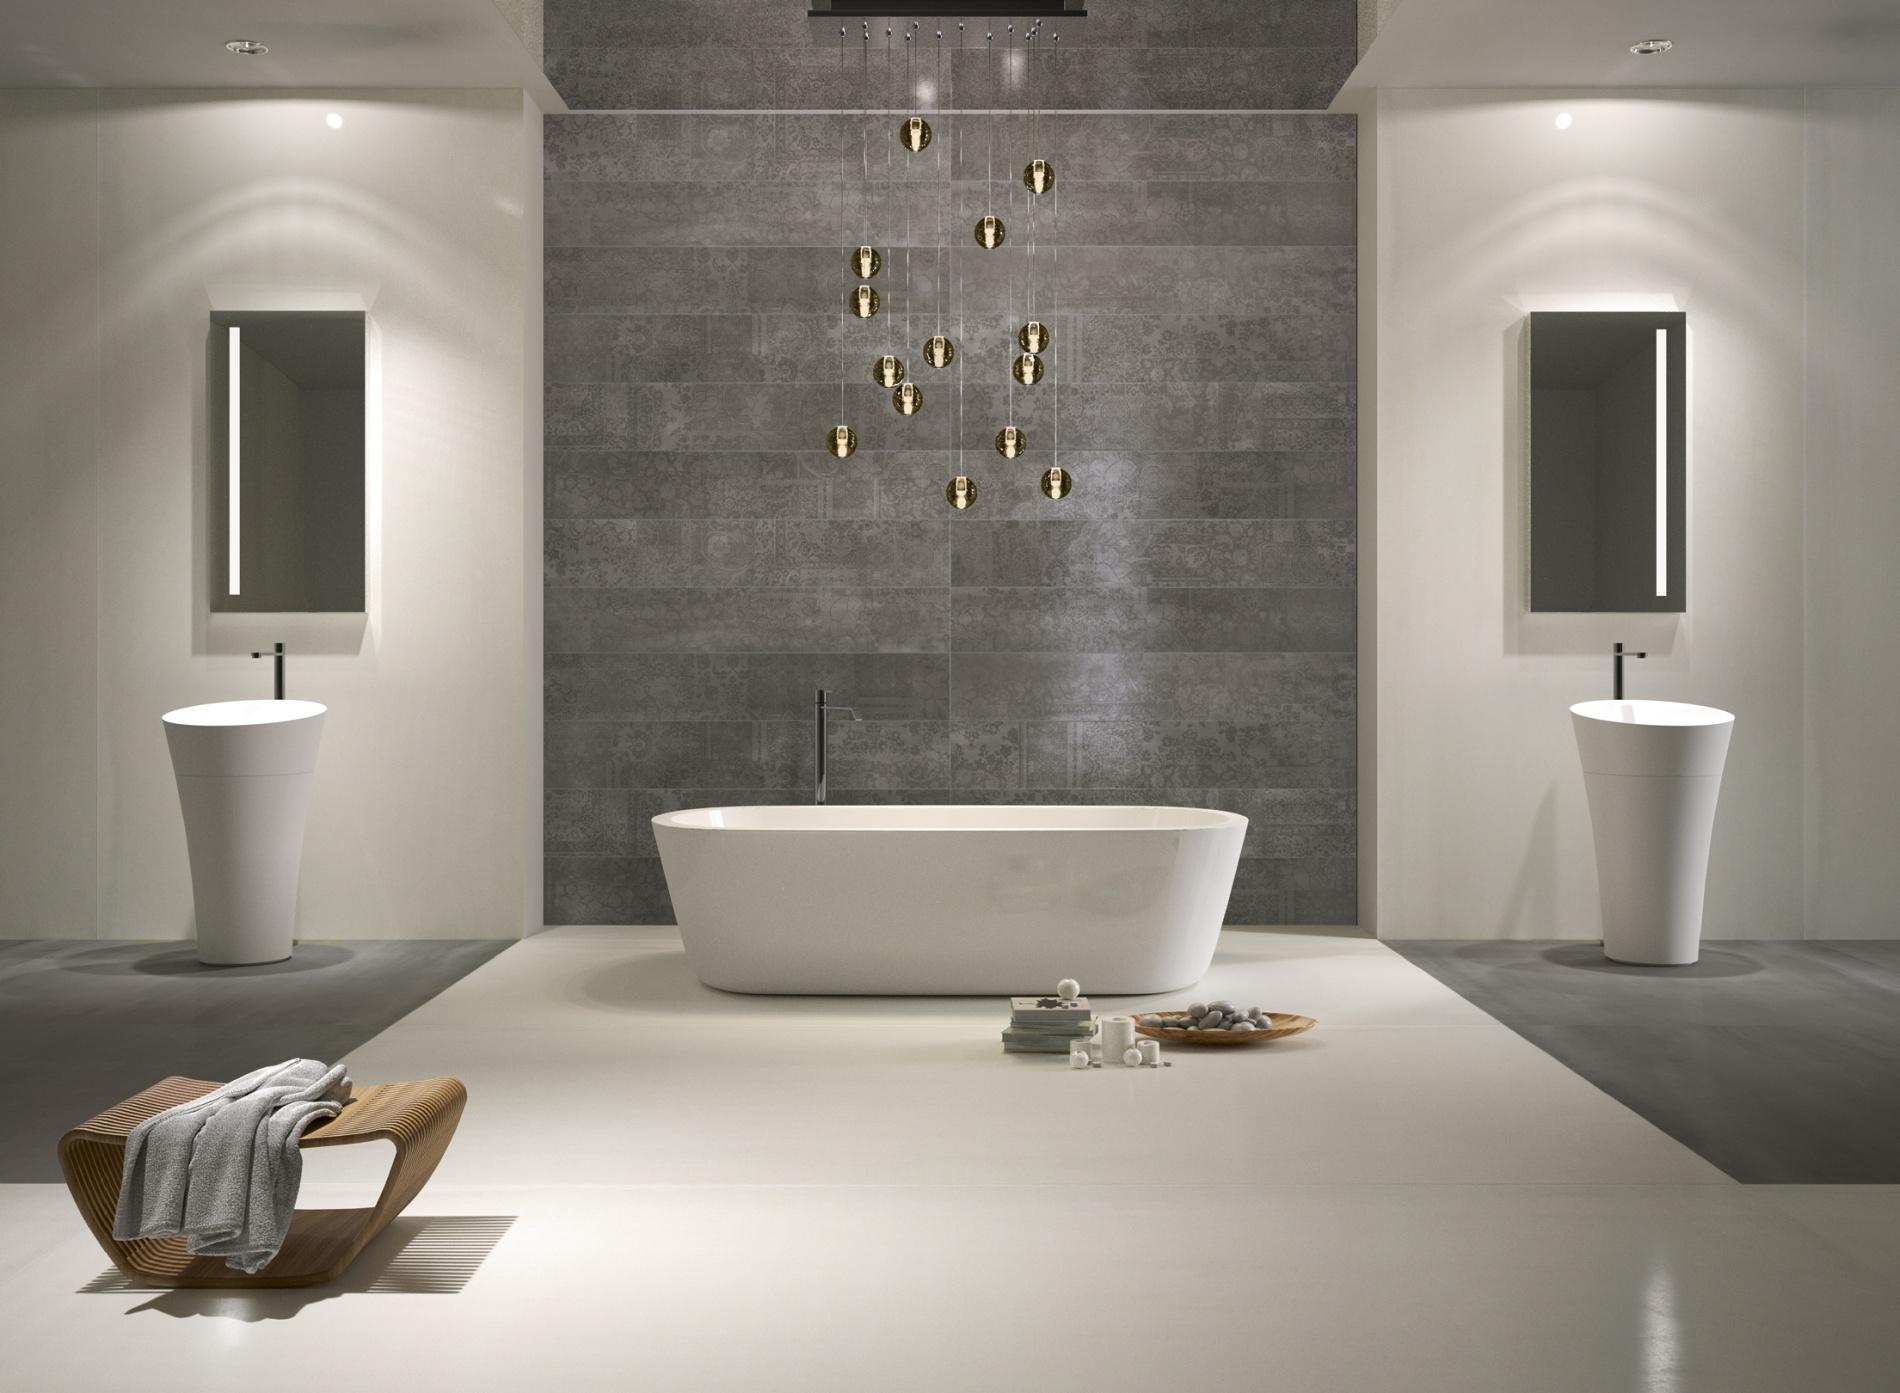 porcelain tile example: Iconic range high resolution photo